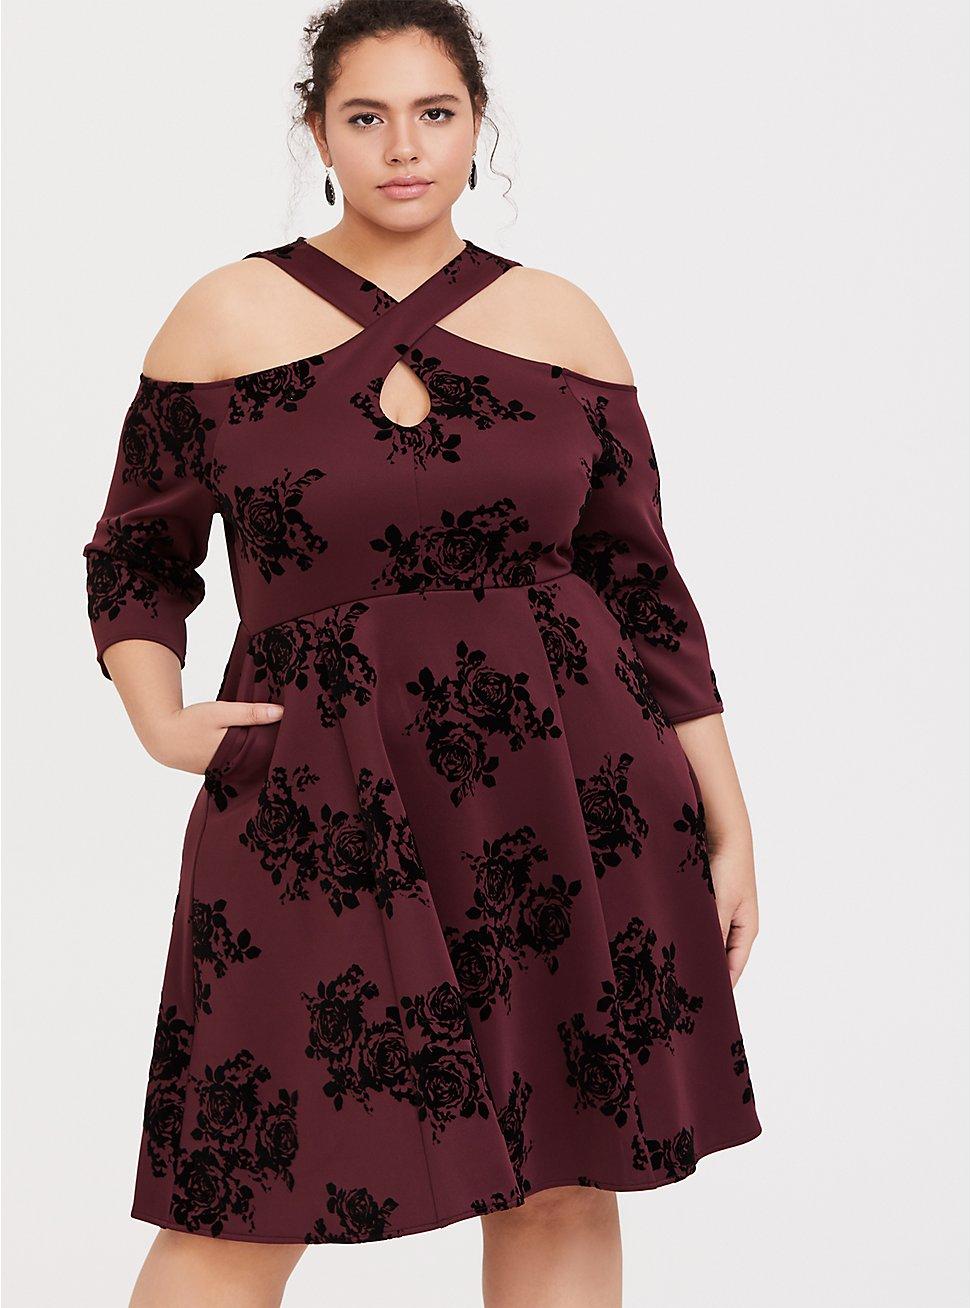 Burgundy Purple Flocked Scuba Knit Halter Skater Dress, ROSEY FLOCK, hi-res